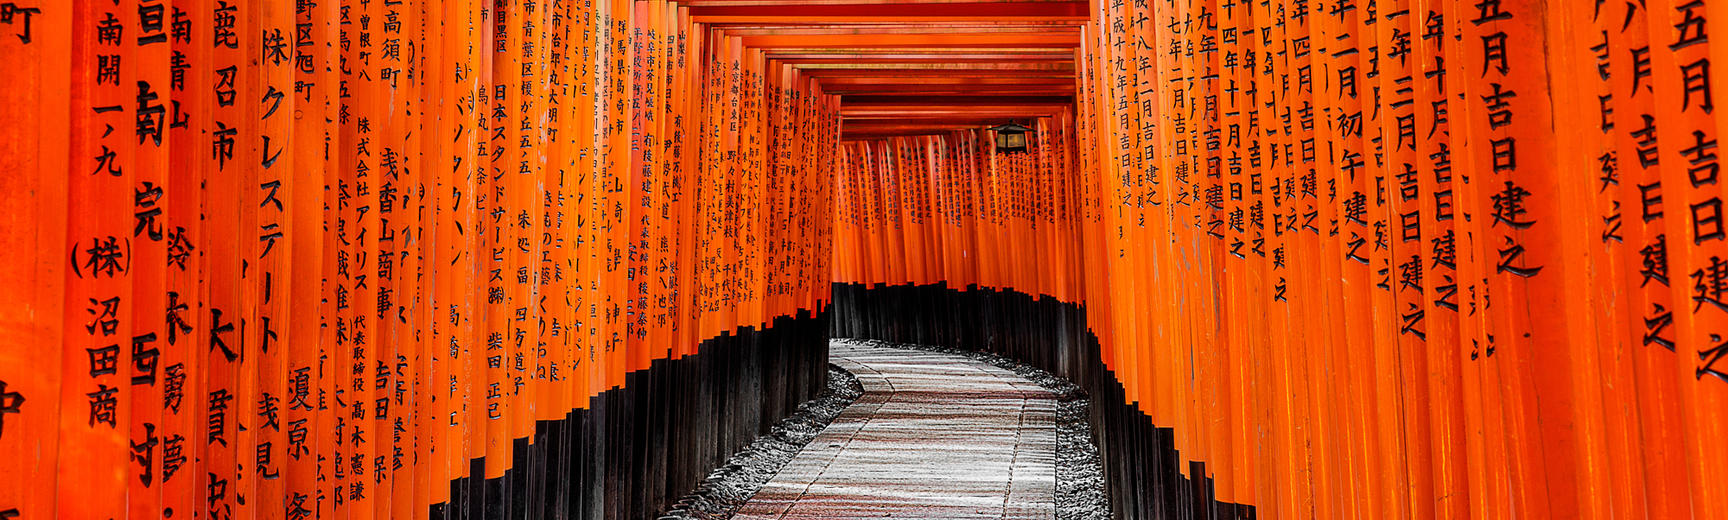 Torii leading to the outer shrine, at the Fushimi Inari-taisha in Kyoto